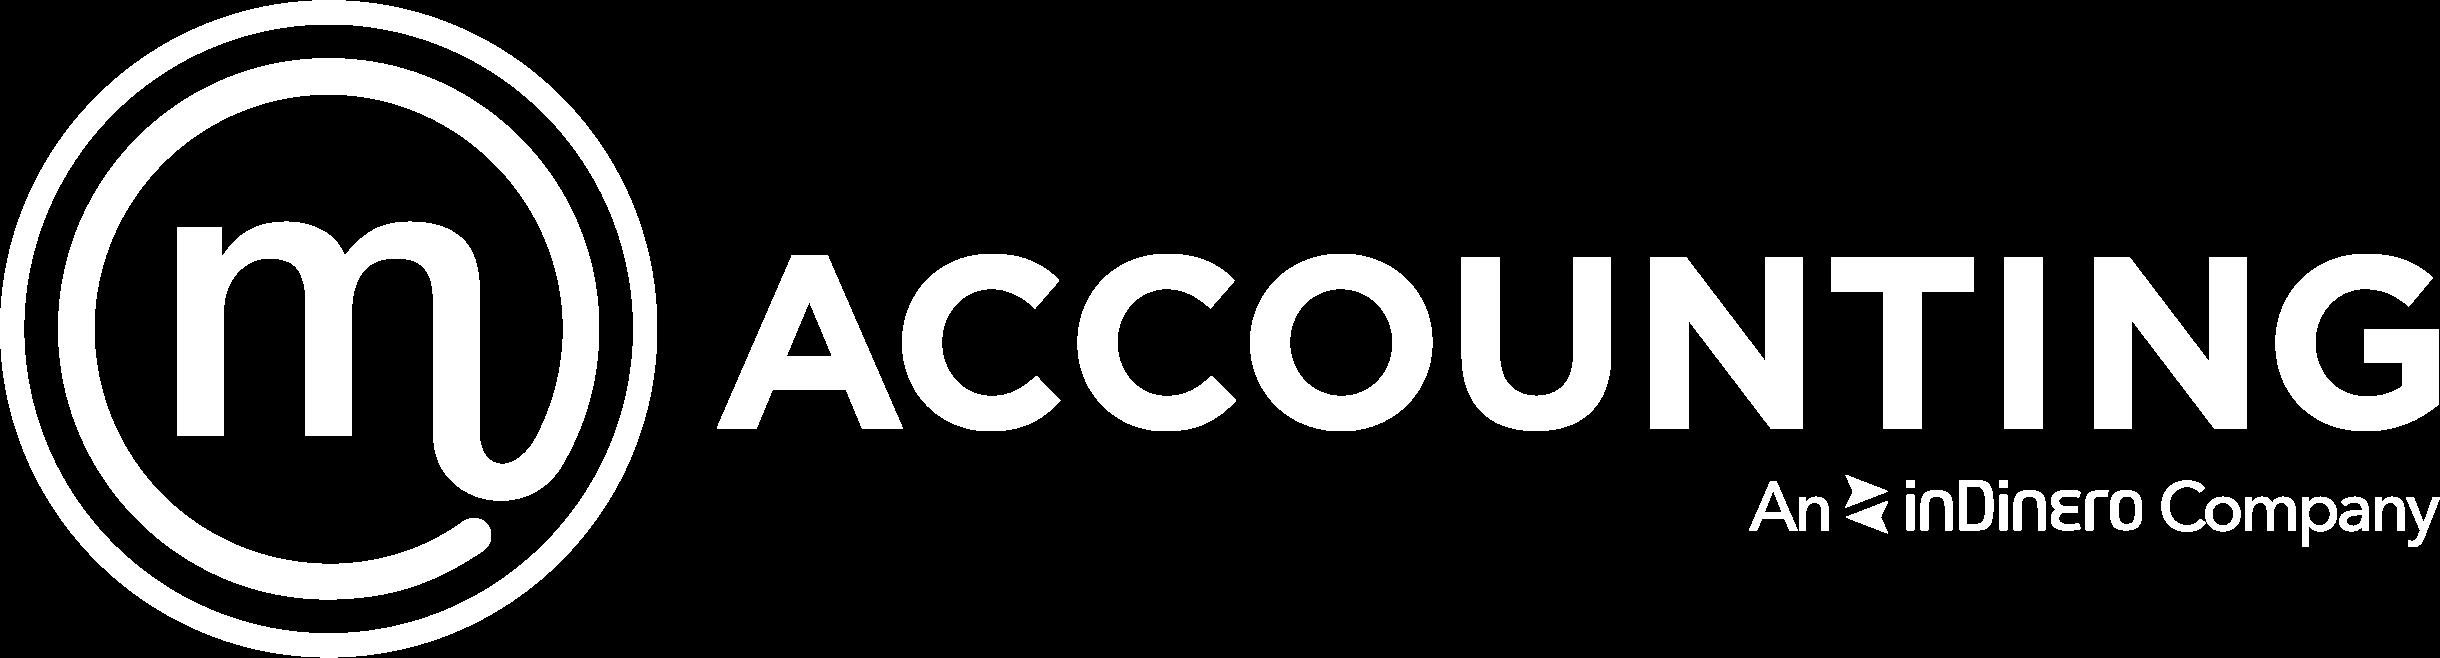 mAccounting logo